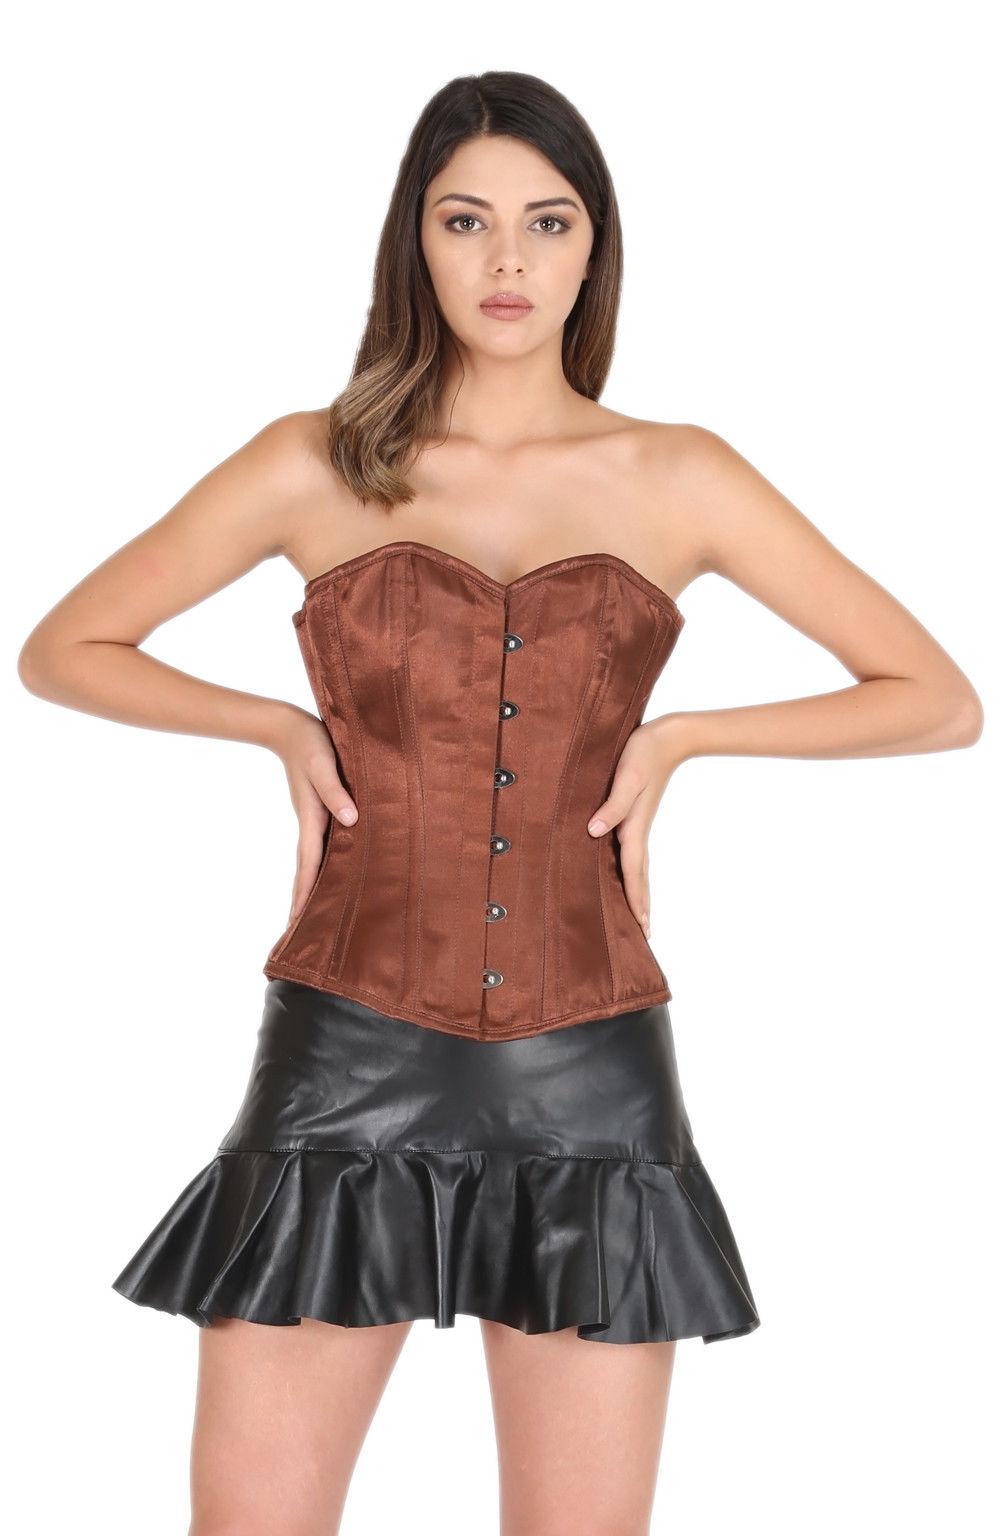 Brown Satin Gothic Burlesque Waist Training Bustier Overbust Prom Corset Top